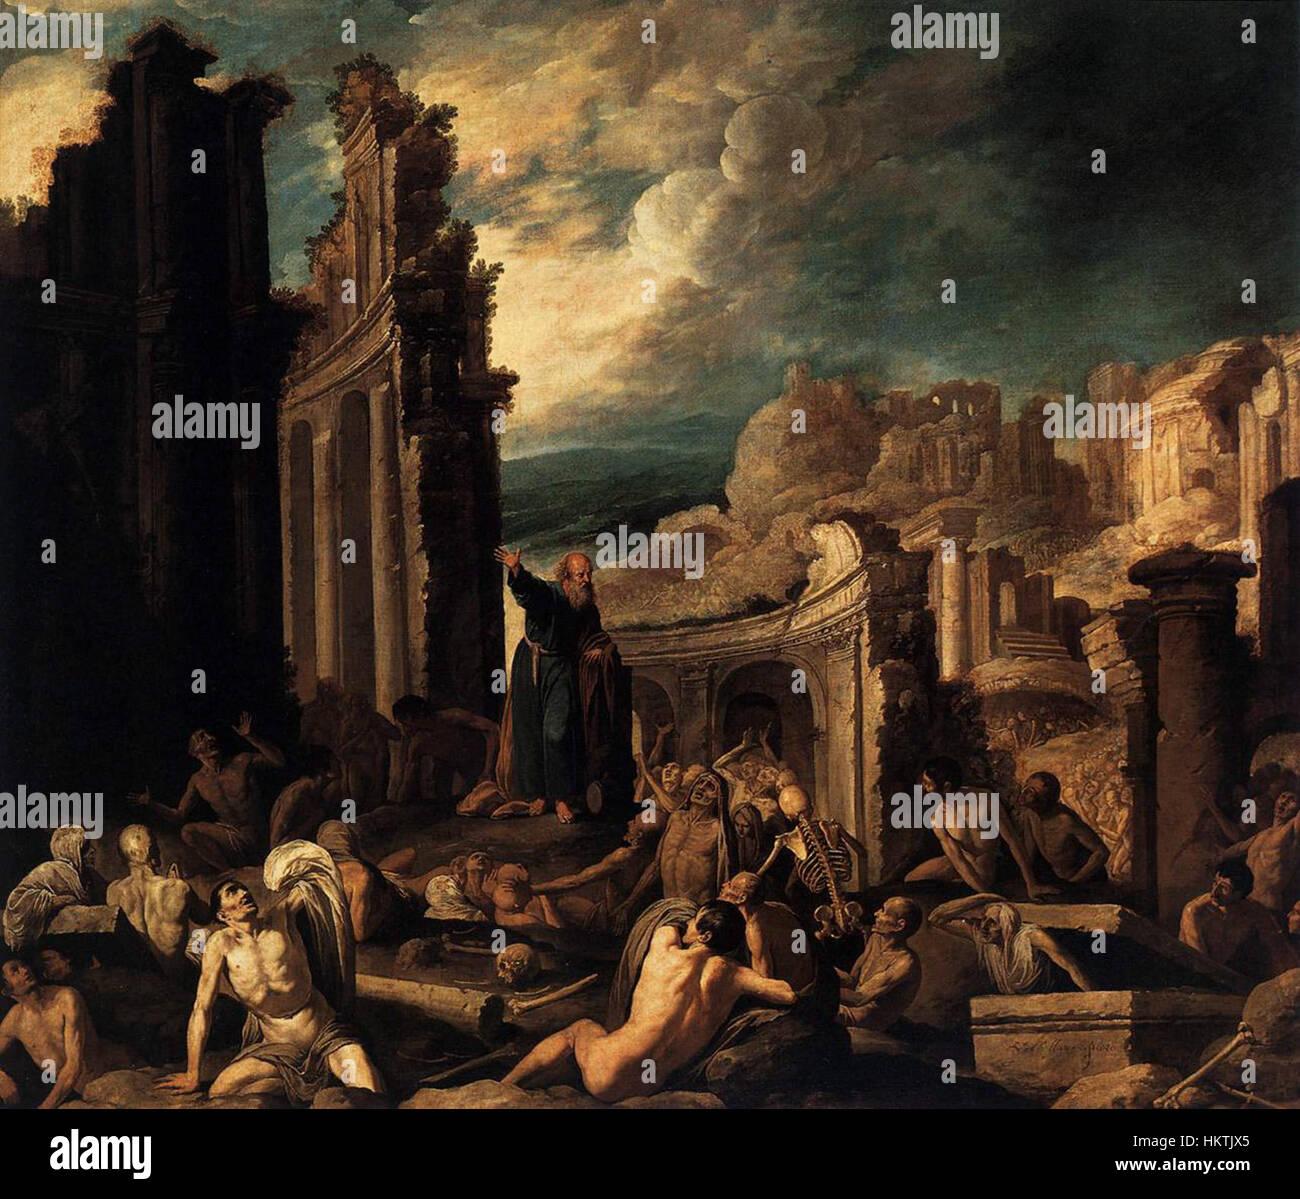 Francisco Collantes - The Vision of Ezekiel - WGA5153 - Stock Image